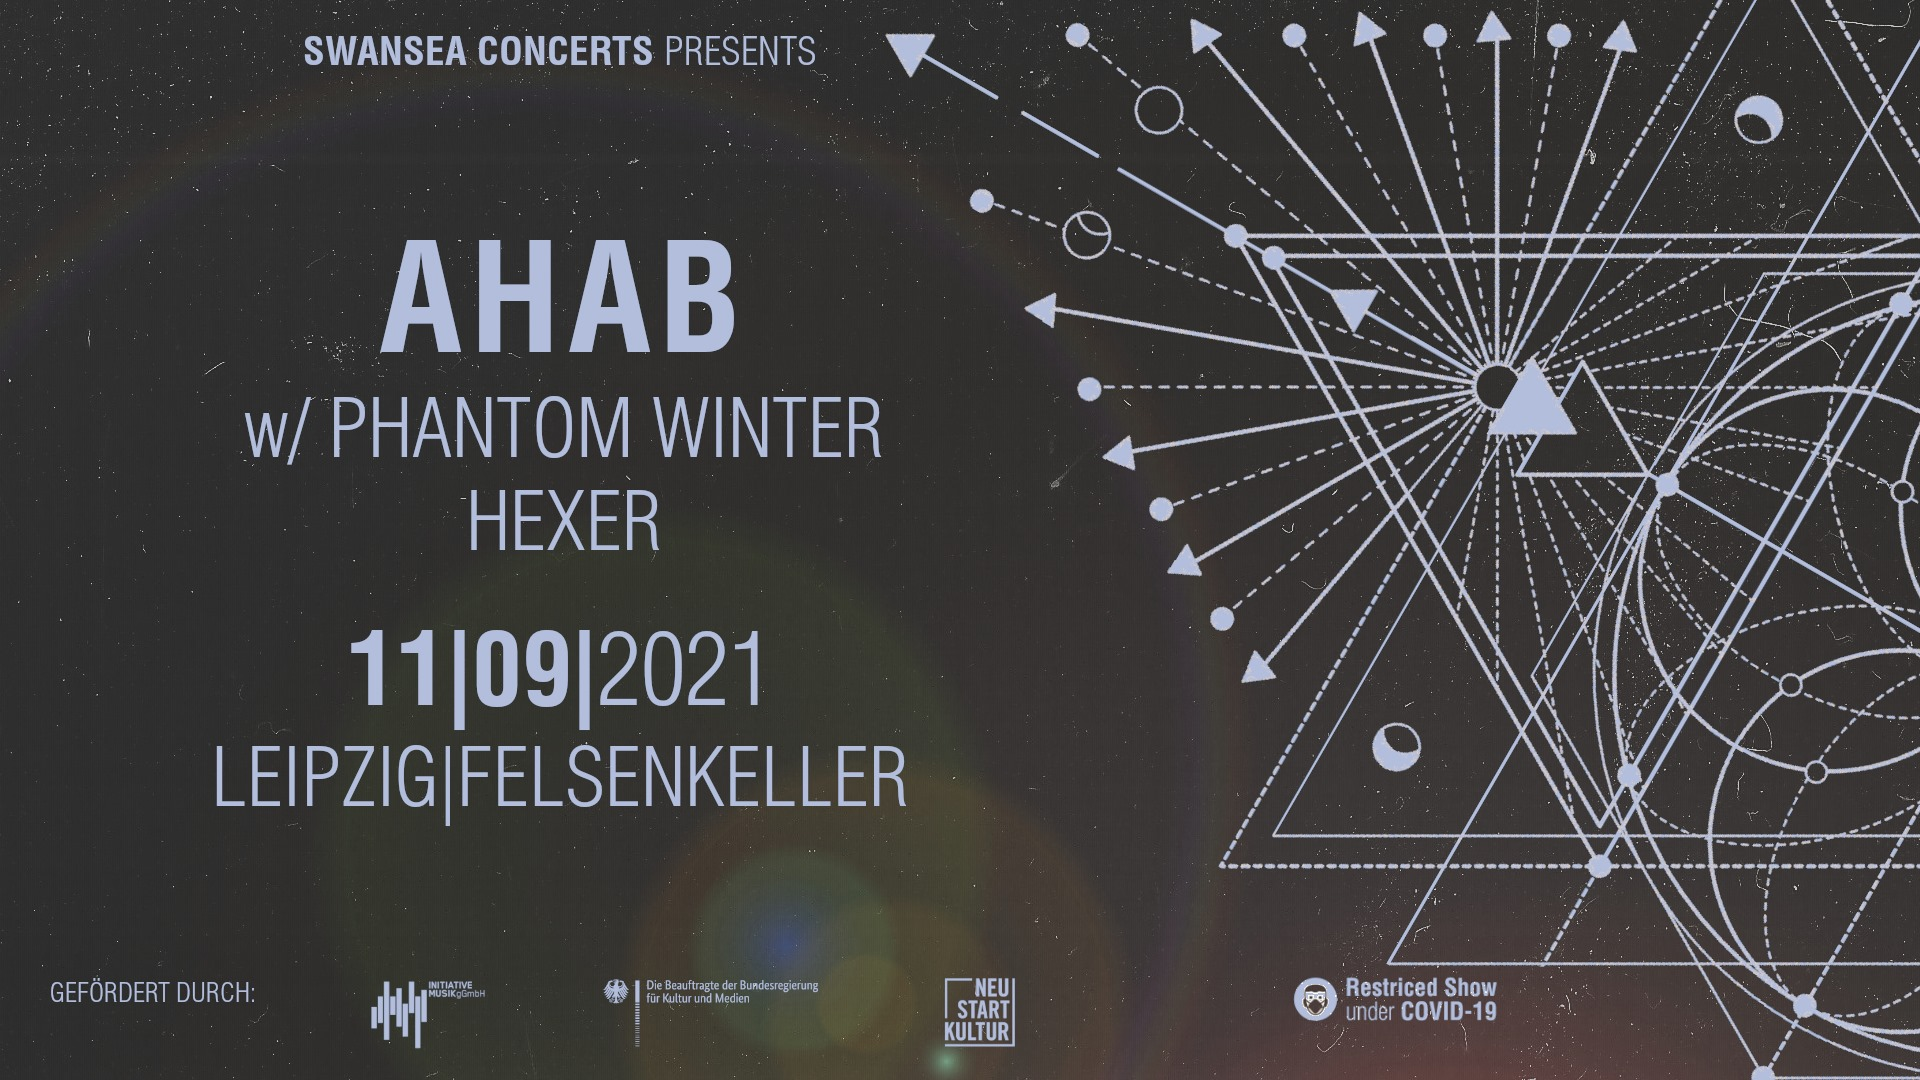 Ahab w/ Phantom Winter & Hexer